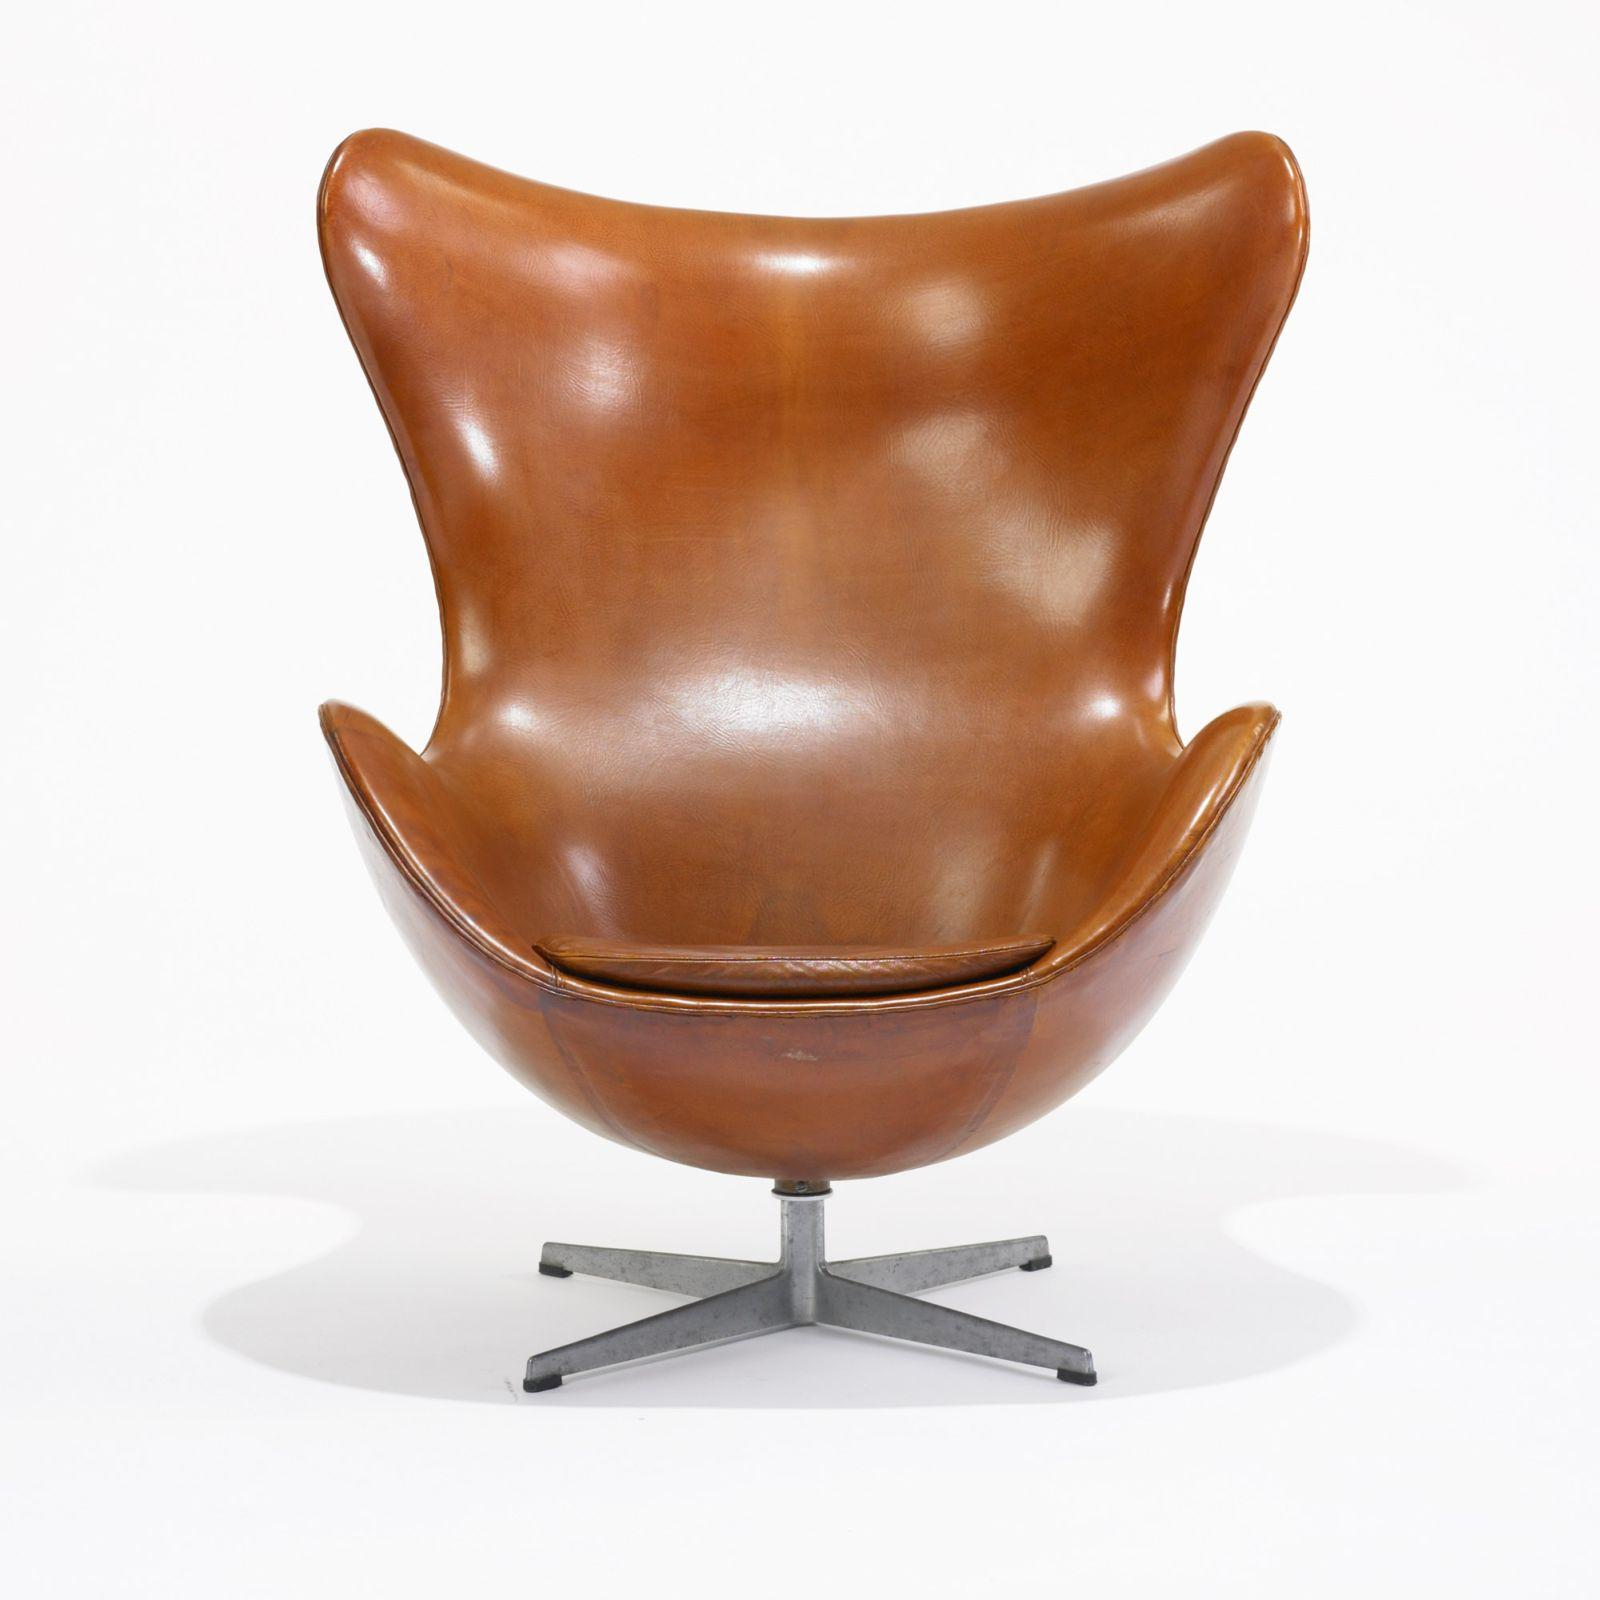 De Egg Chair.Arne Jacobsen Egg Chair